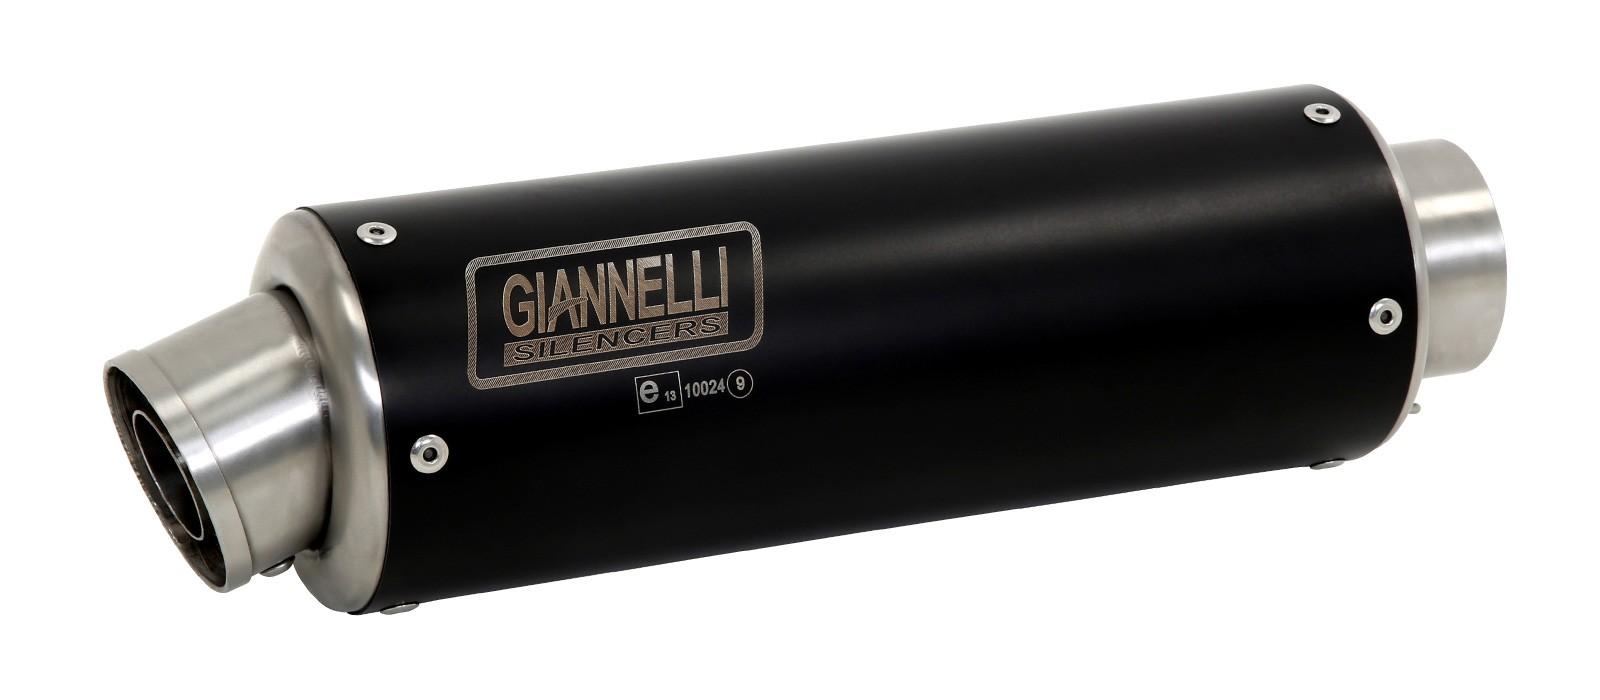 ESCAPES GIANNELLI UNIVERSALES - Slip-on nicrom black X-PRO Ducati MULTISTRADA 1200 / 1200S Giannelli 73554XP -